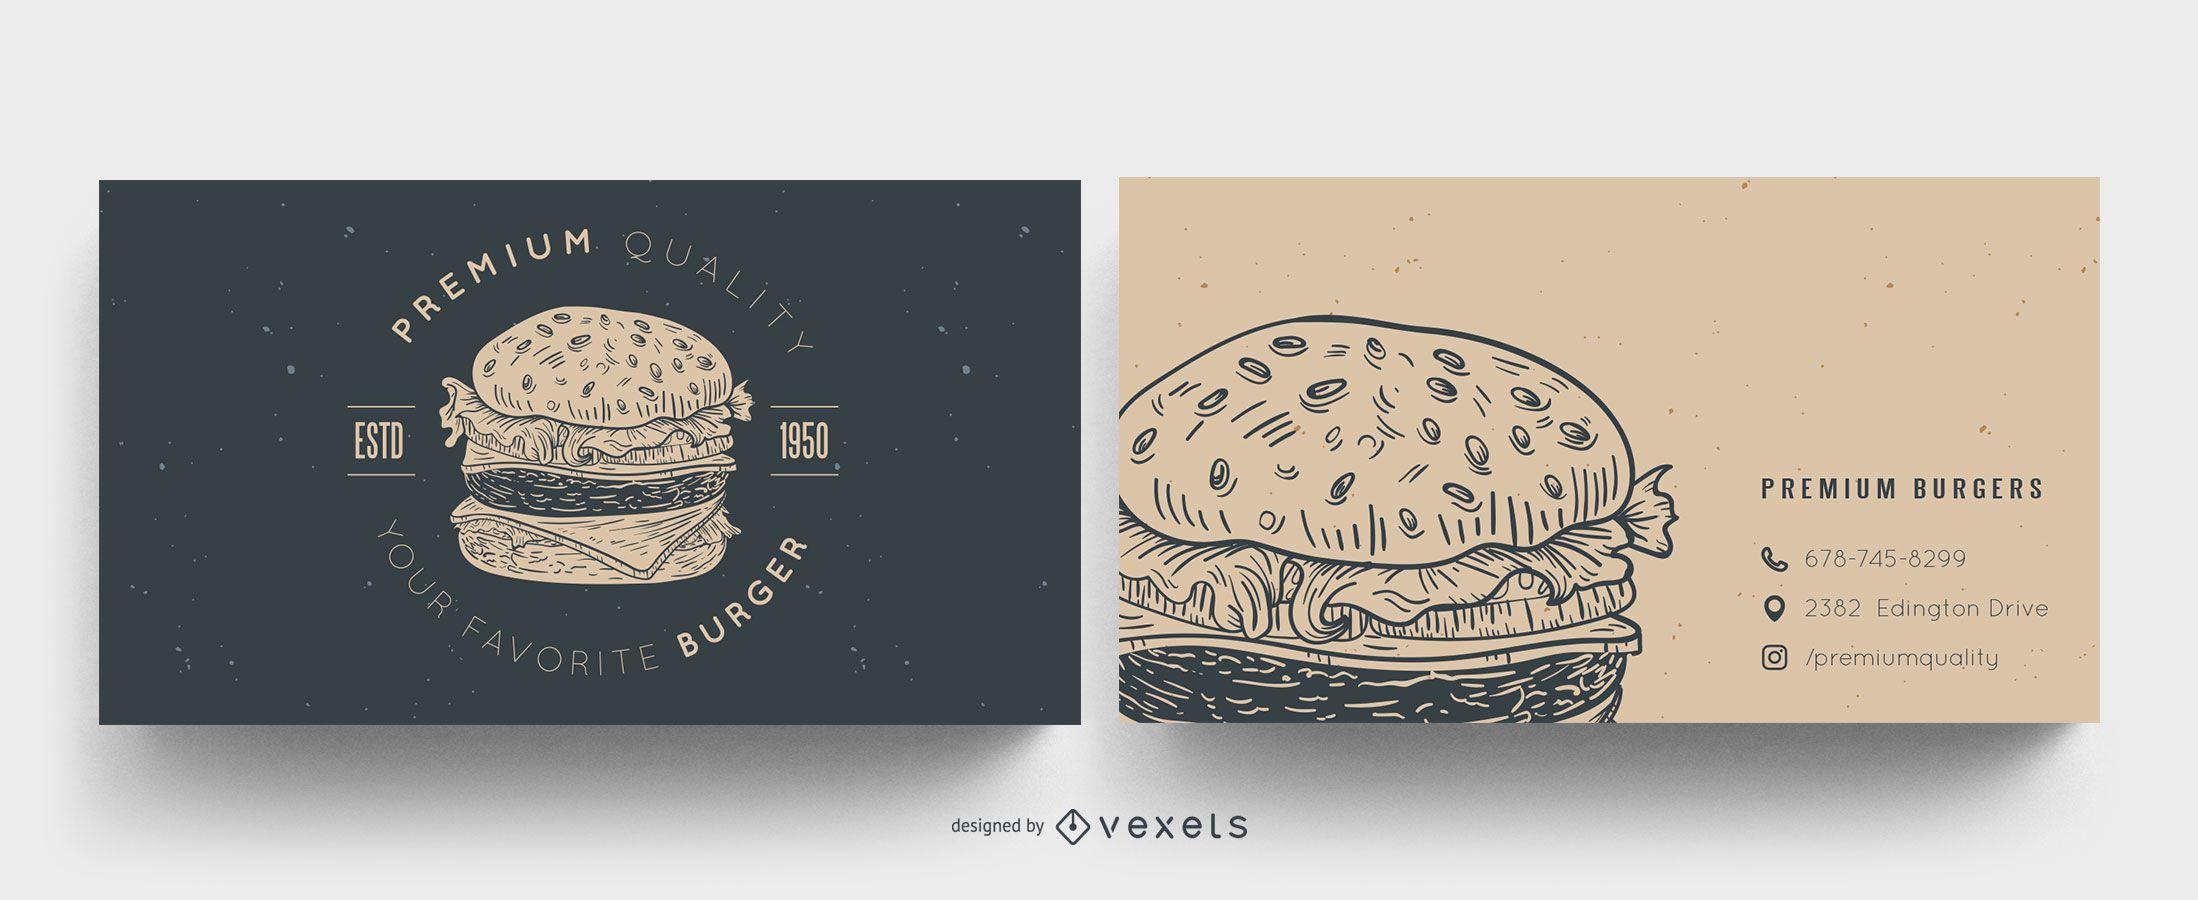 Burger Business Card Design